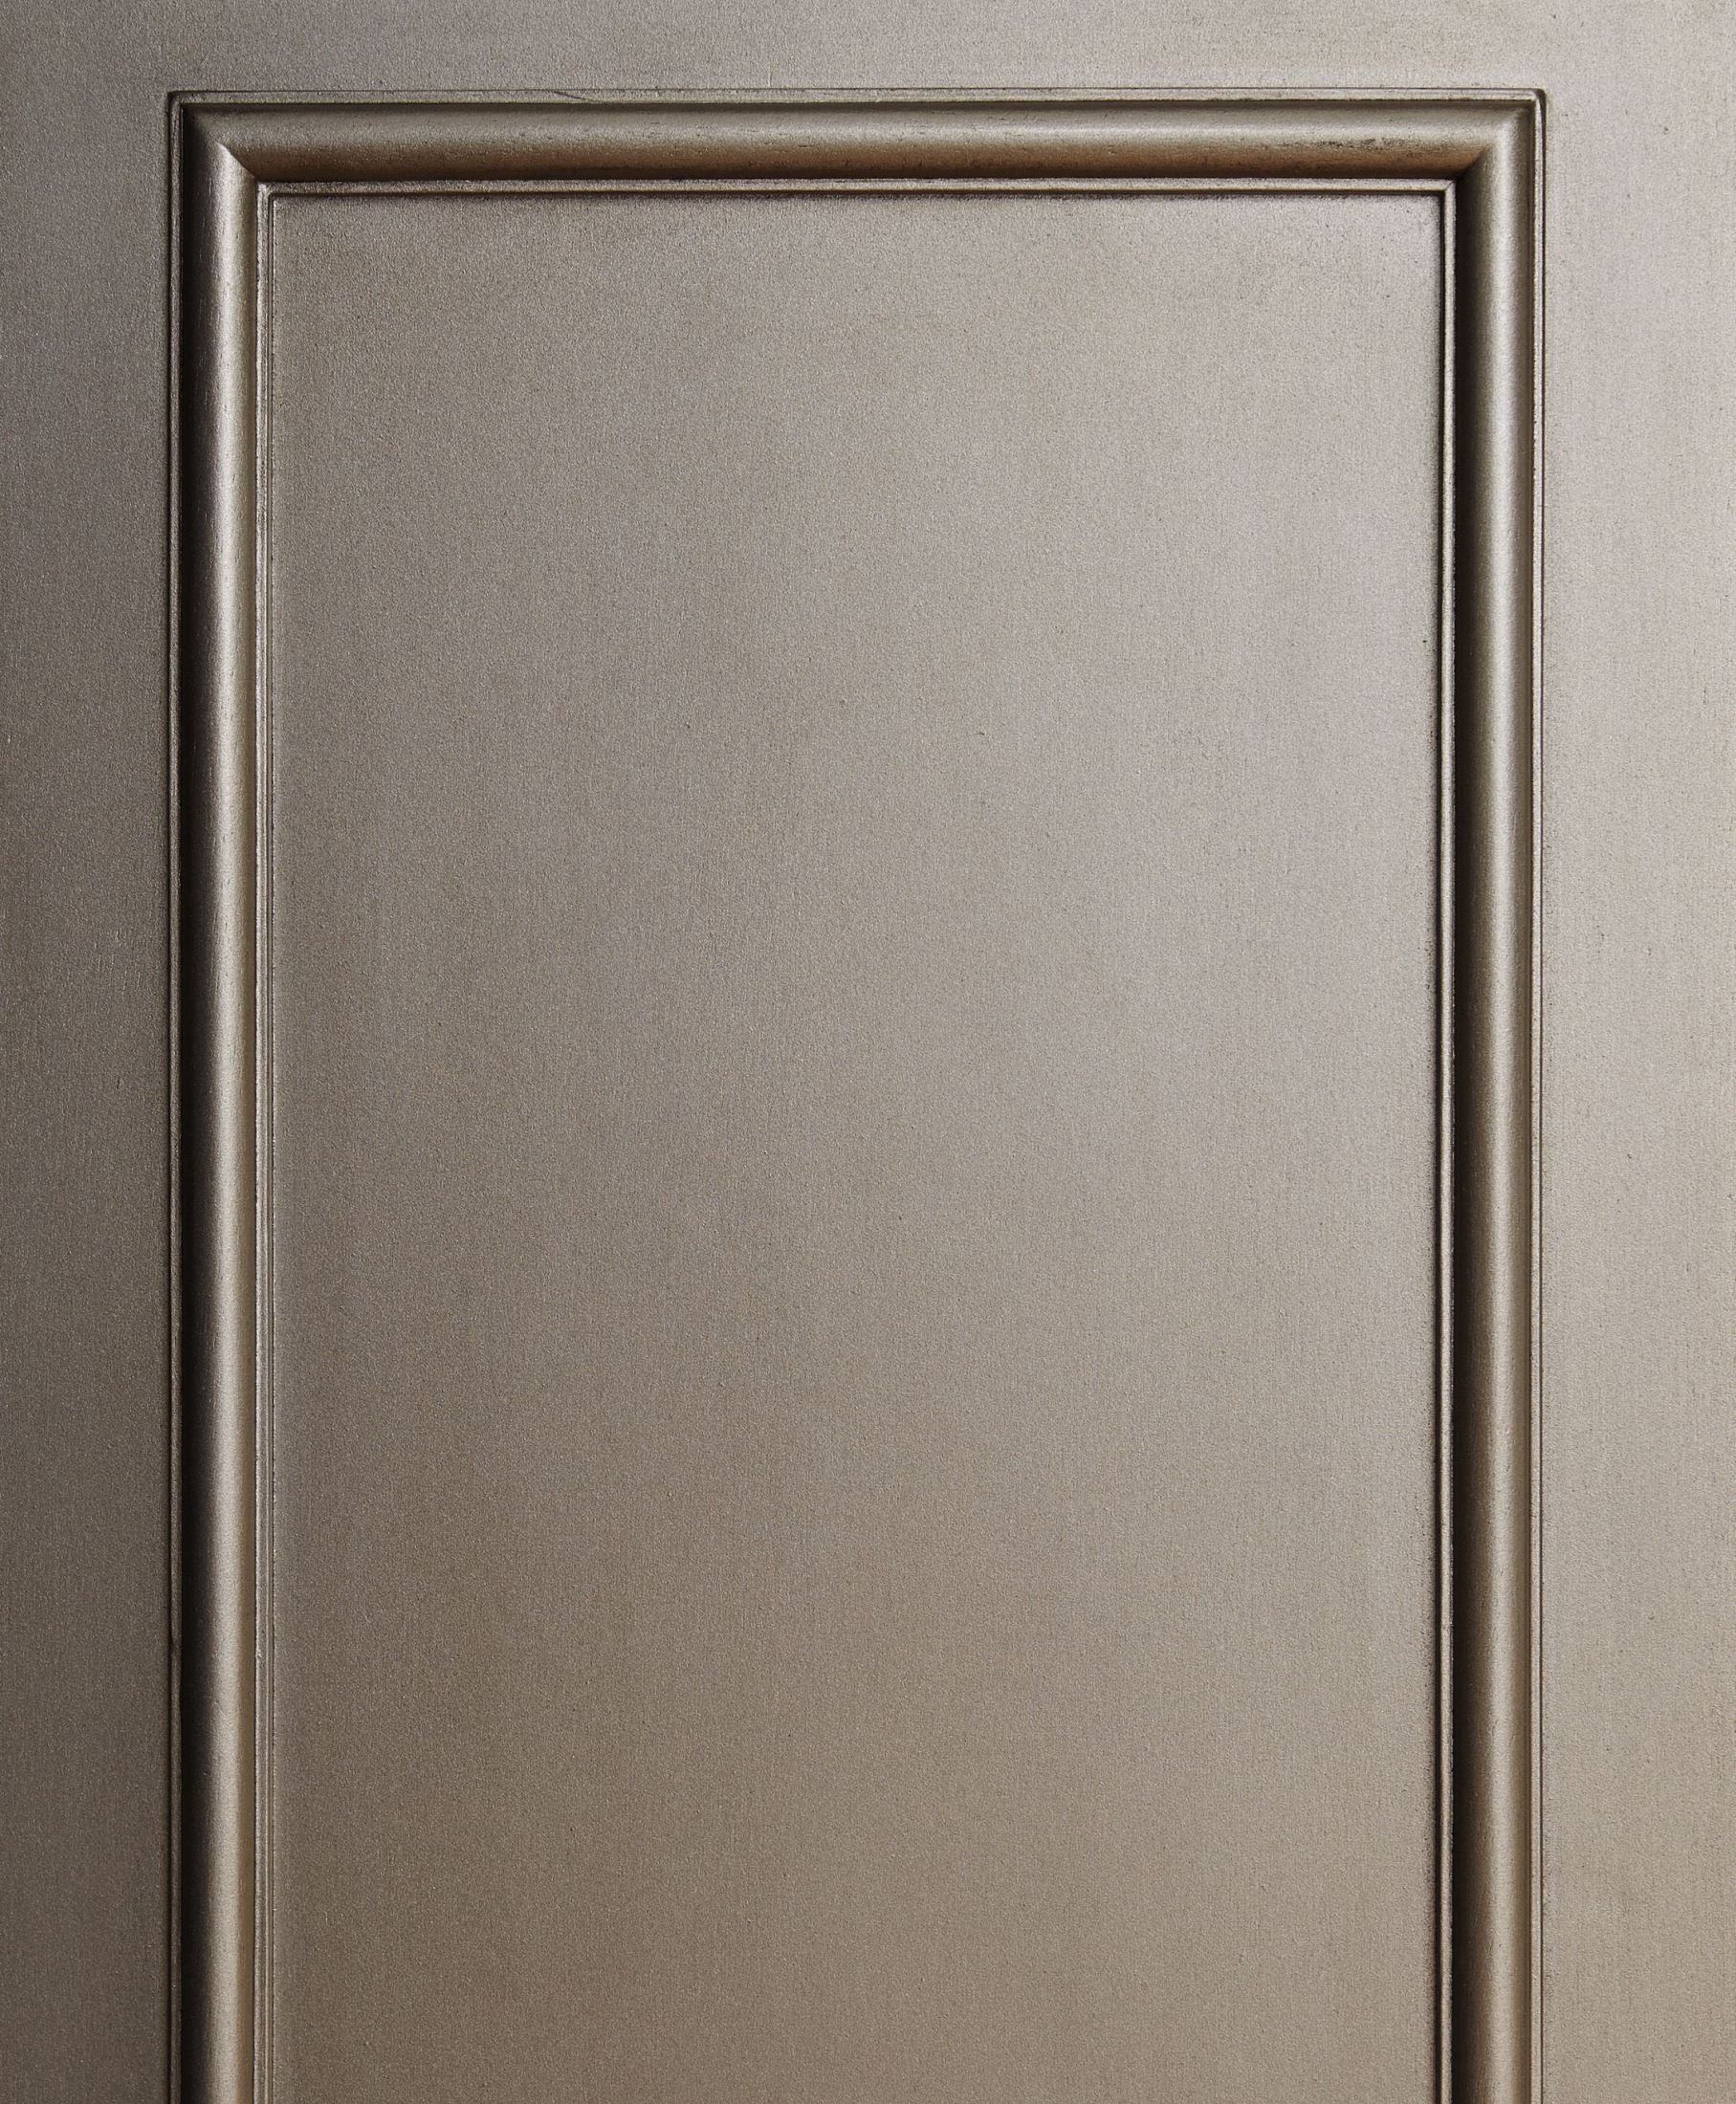 Birlanny Panel Bedroom Set Signature Design 3 Reviews: Birlanny Silver Upholstered Panel Bedroom Set